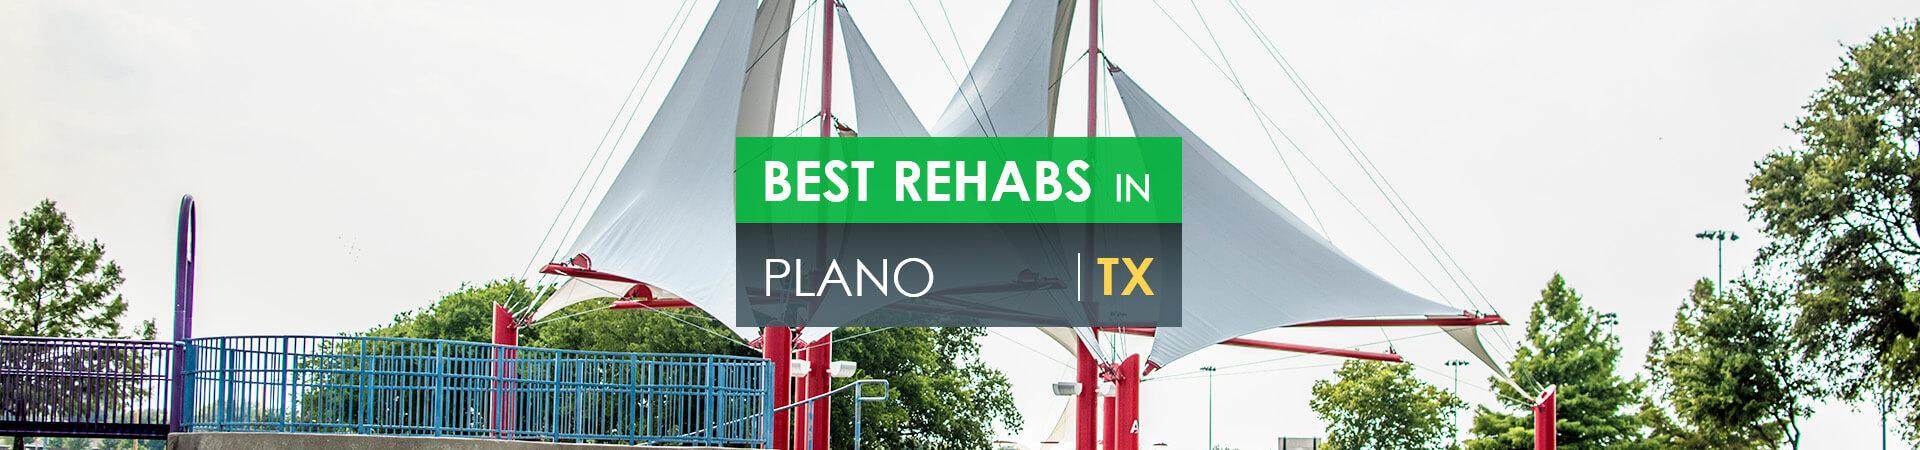 Best rehabs in Plano, TX